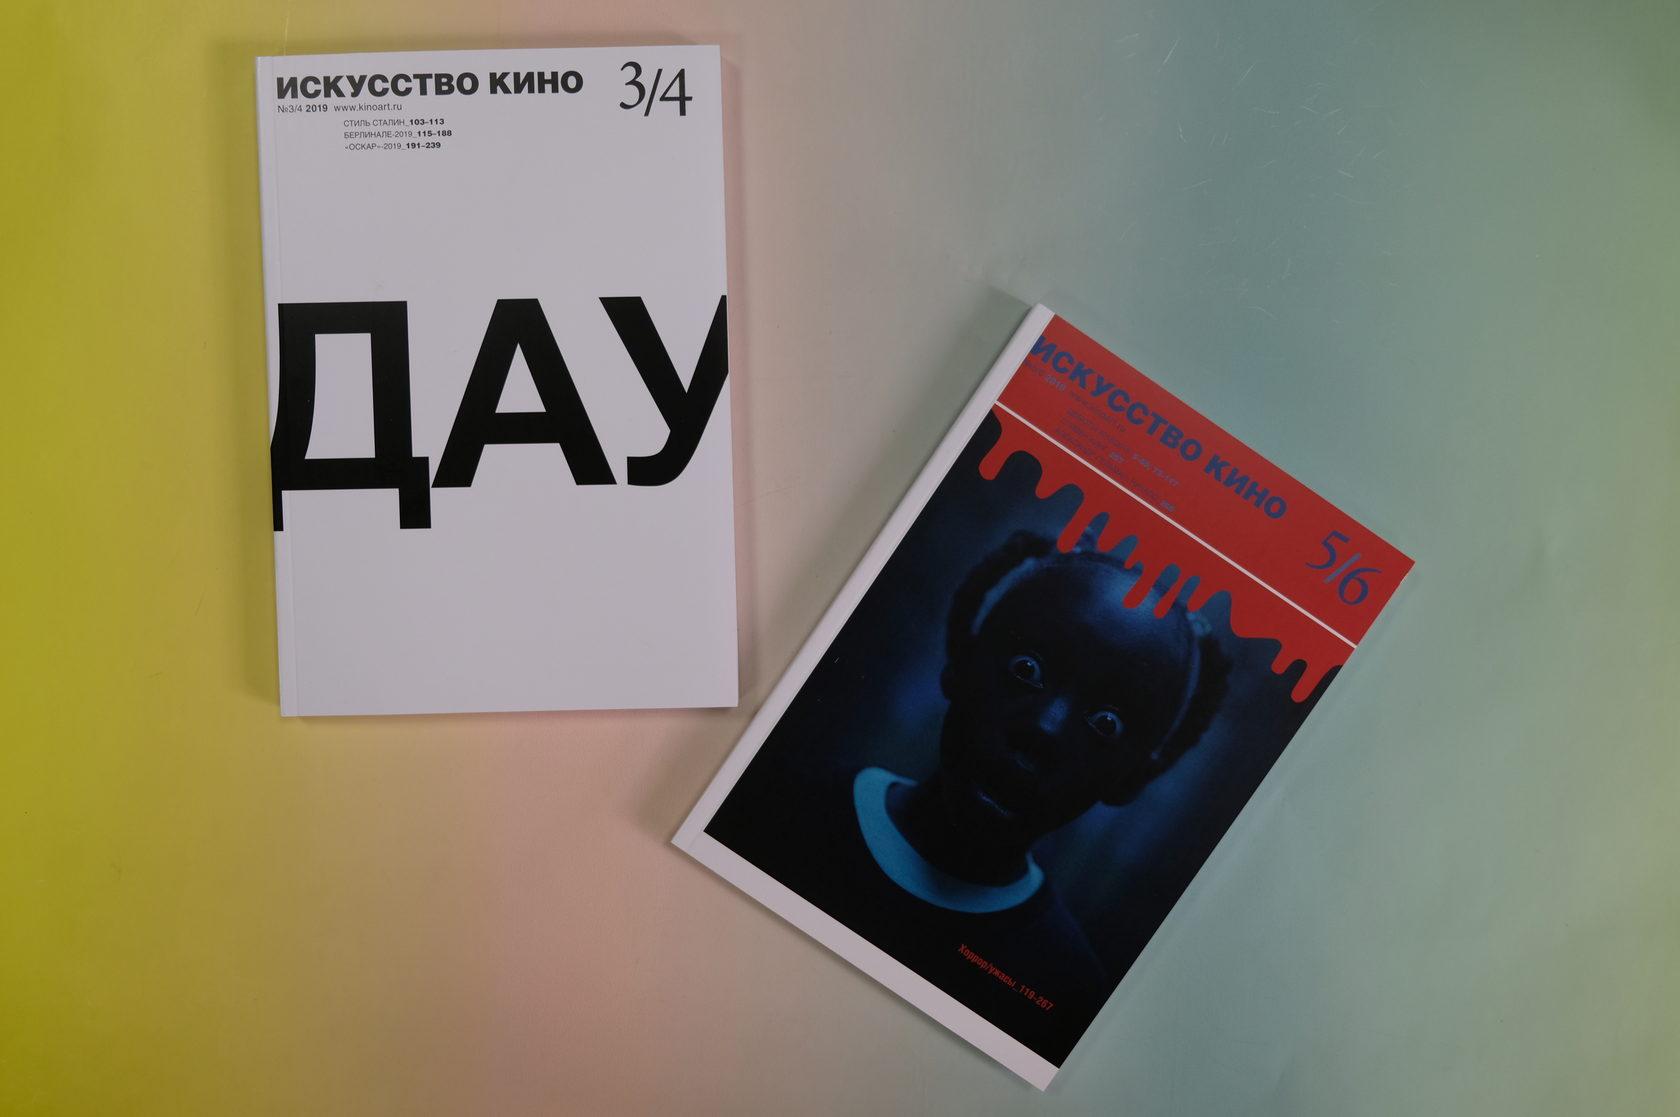 Журнал «Искусство кино»: про «Дау» и Кинотавр-2019